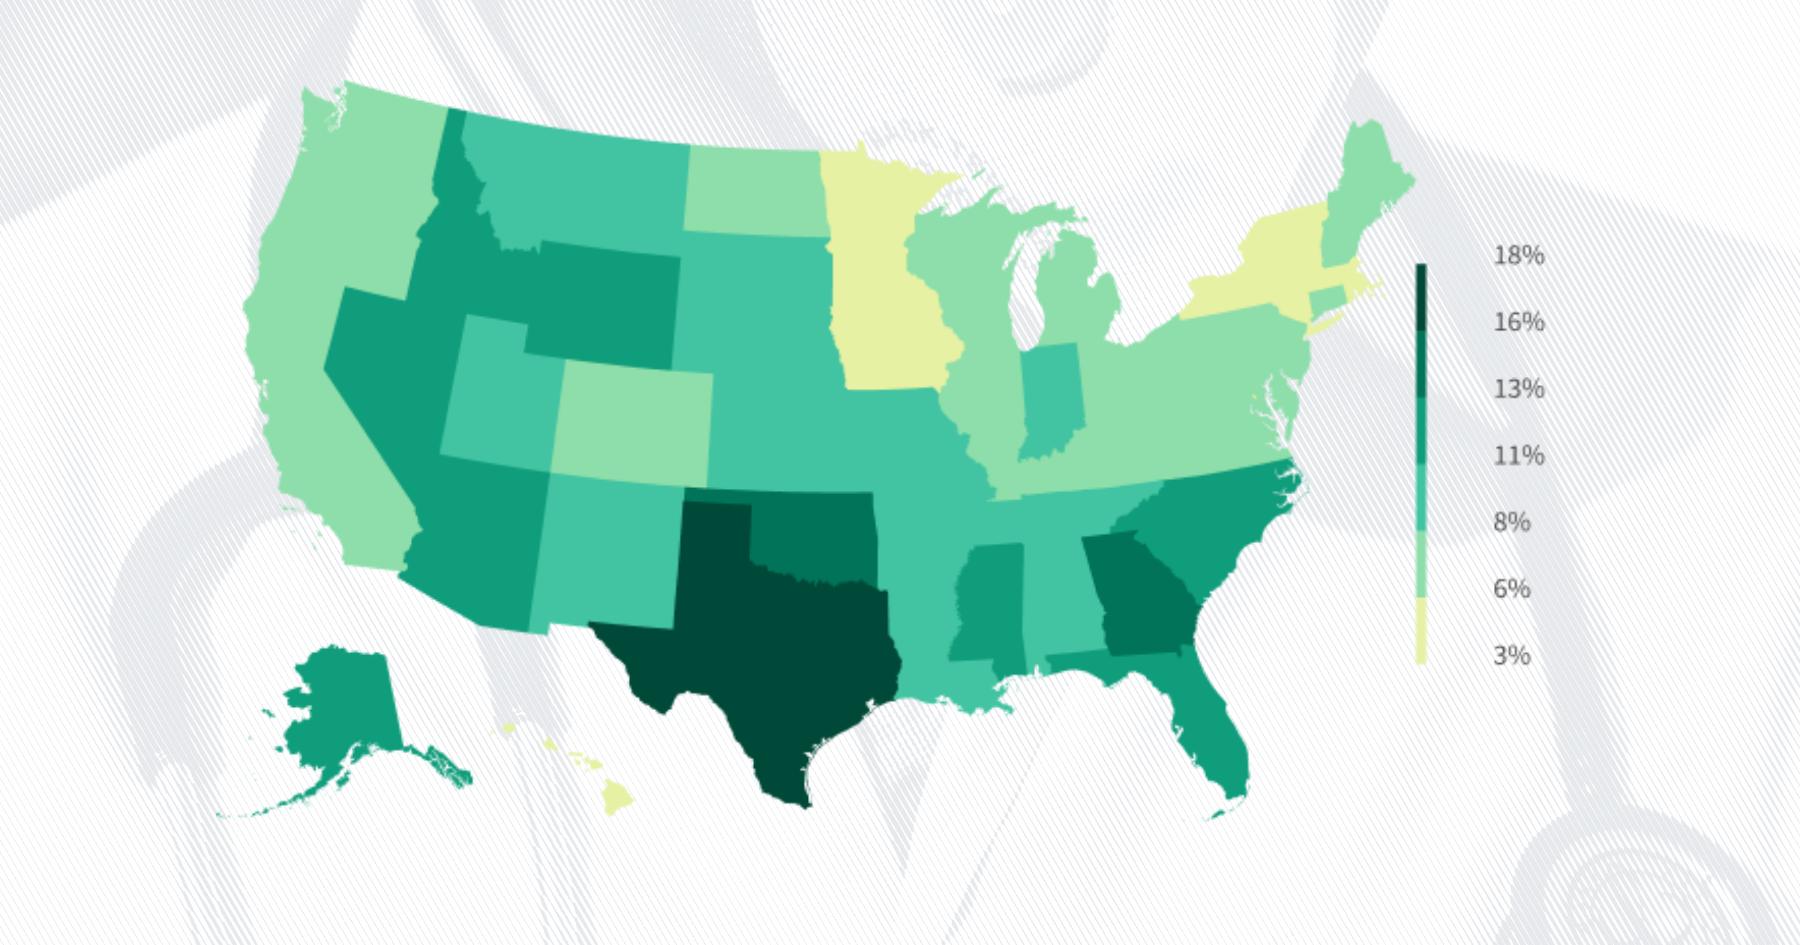 Health insurance data 2019